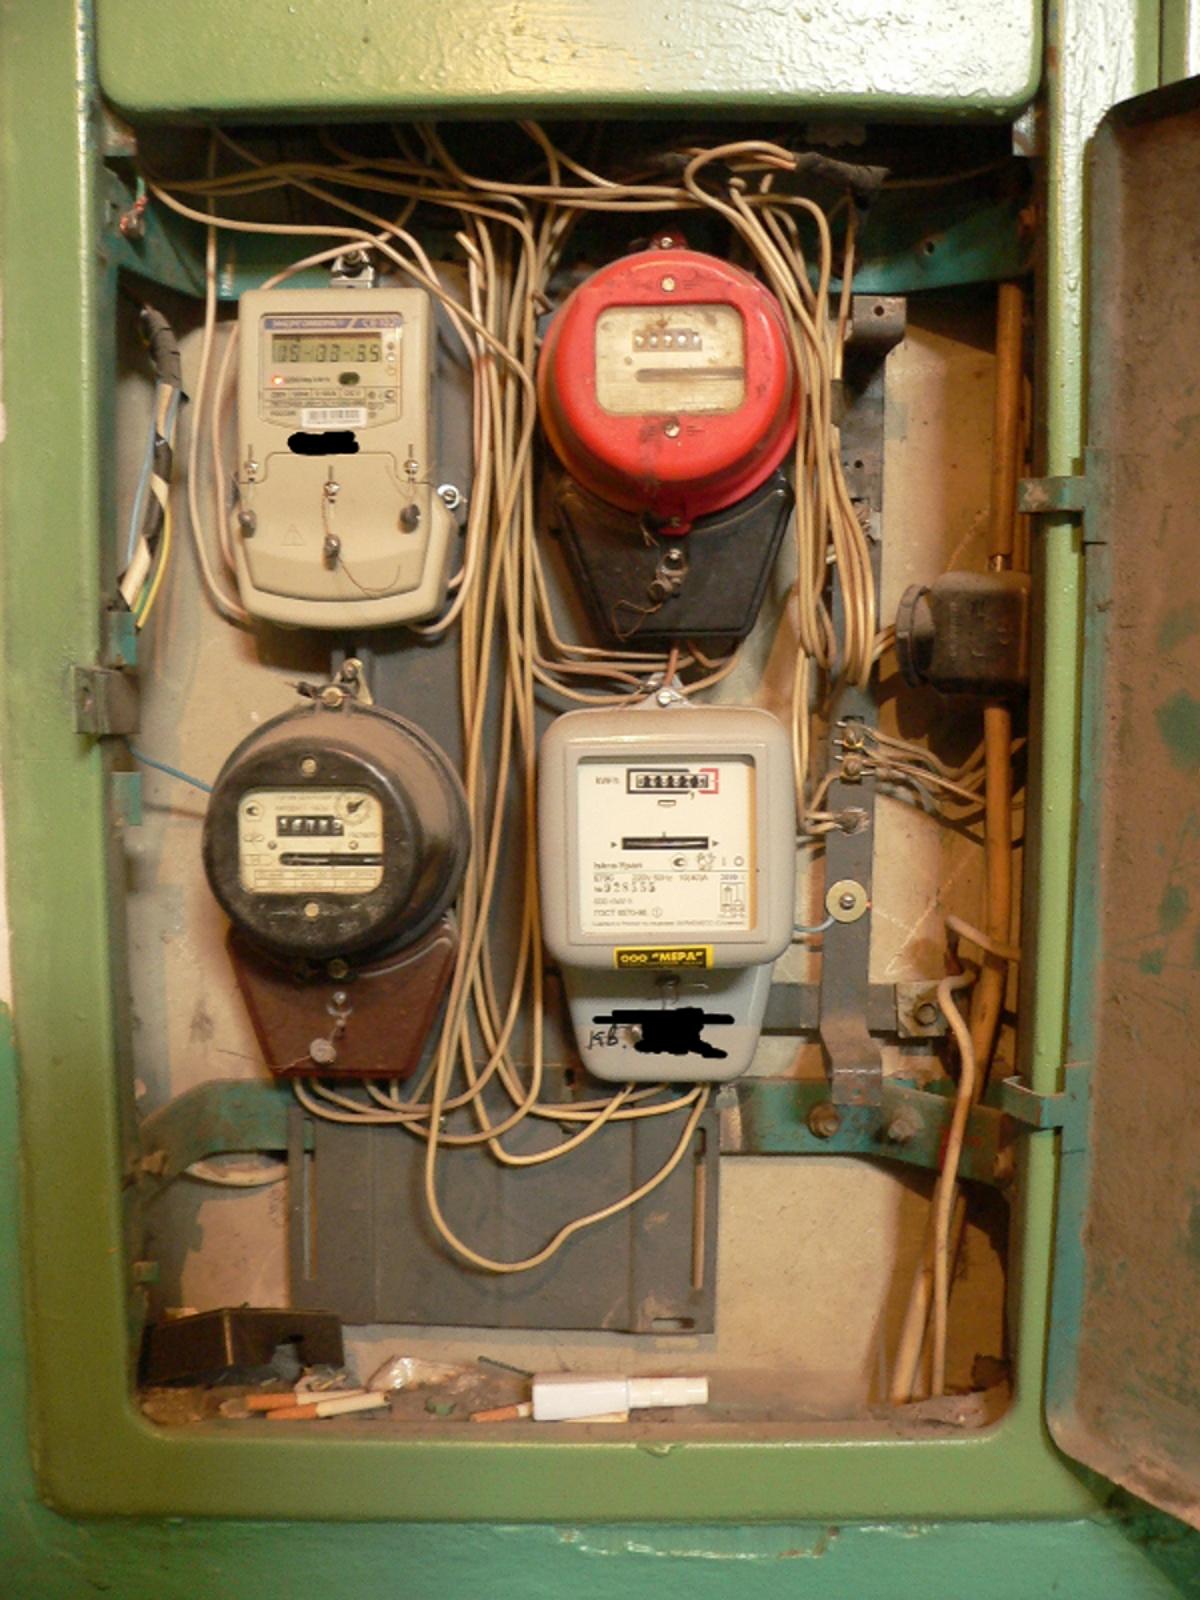 Замена электросчётчика в квартире своими руками